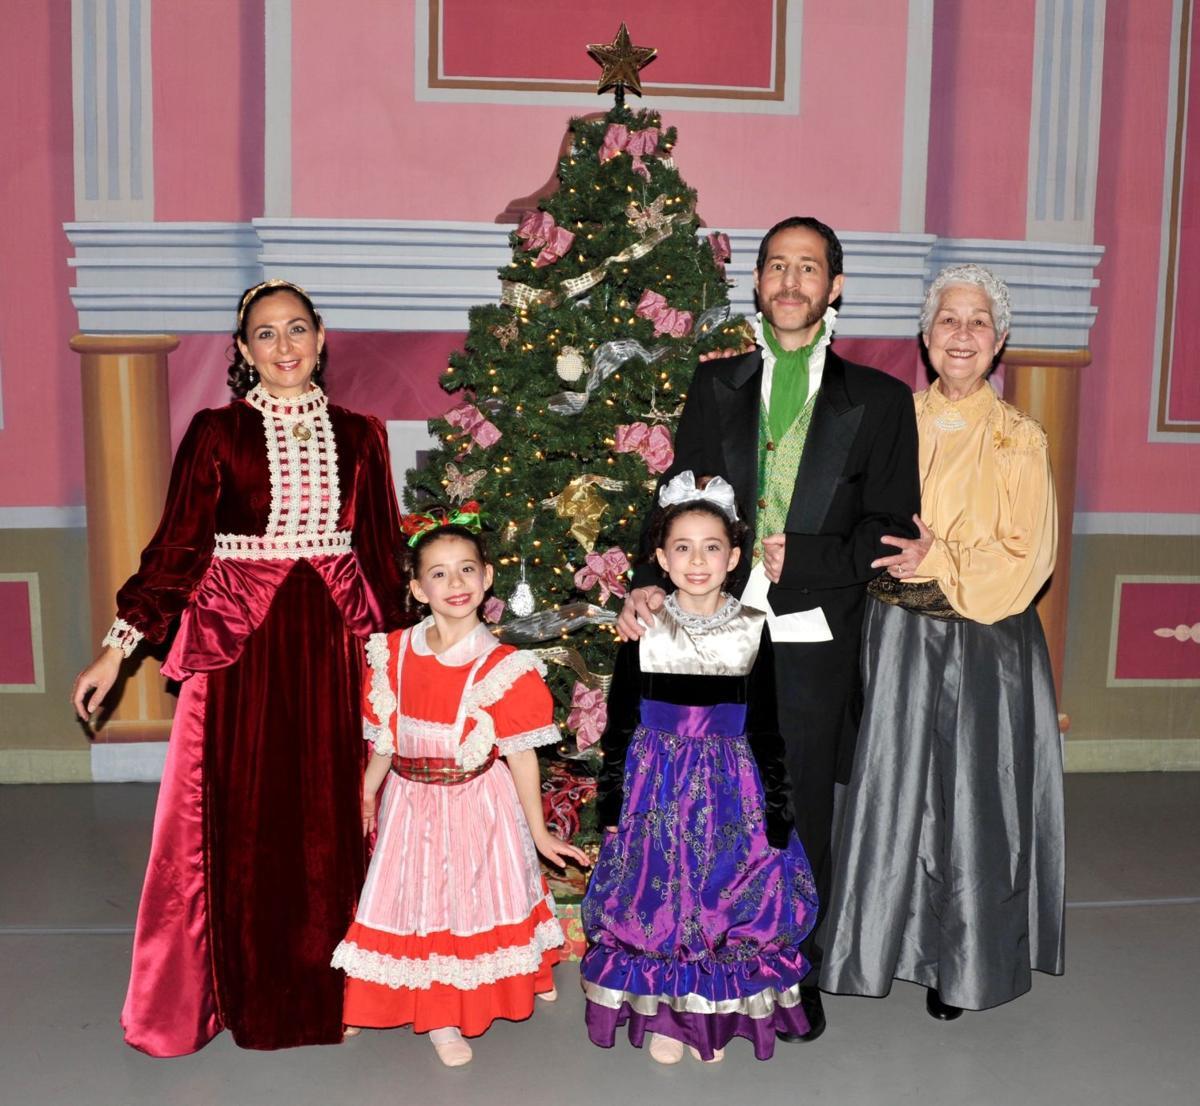 Finkelstein Family